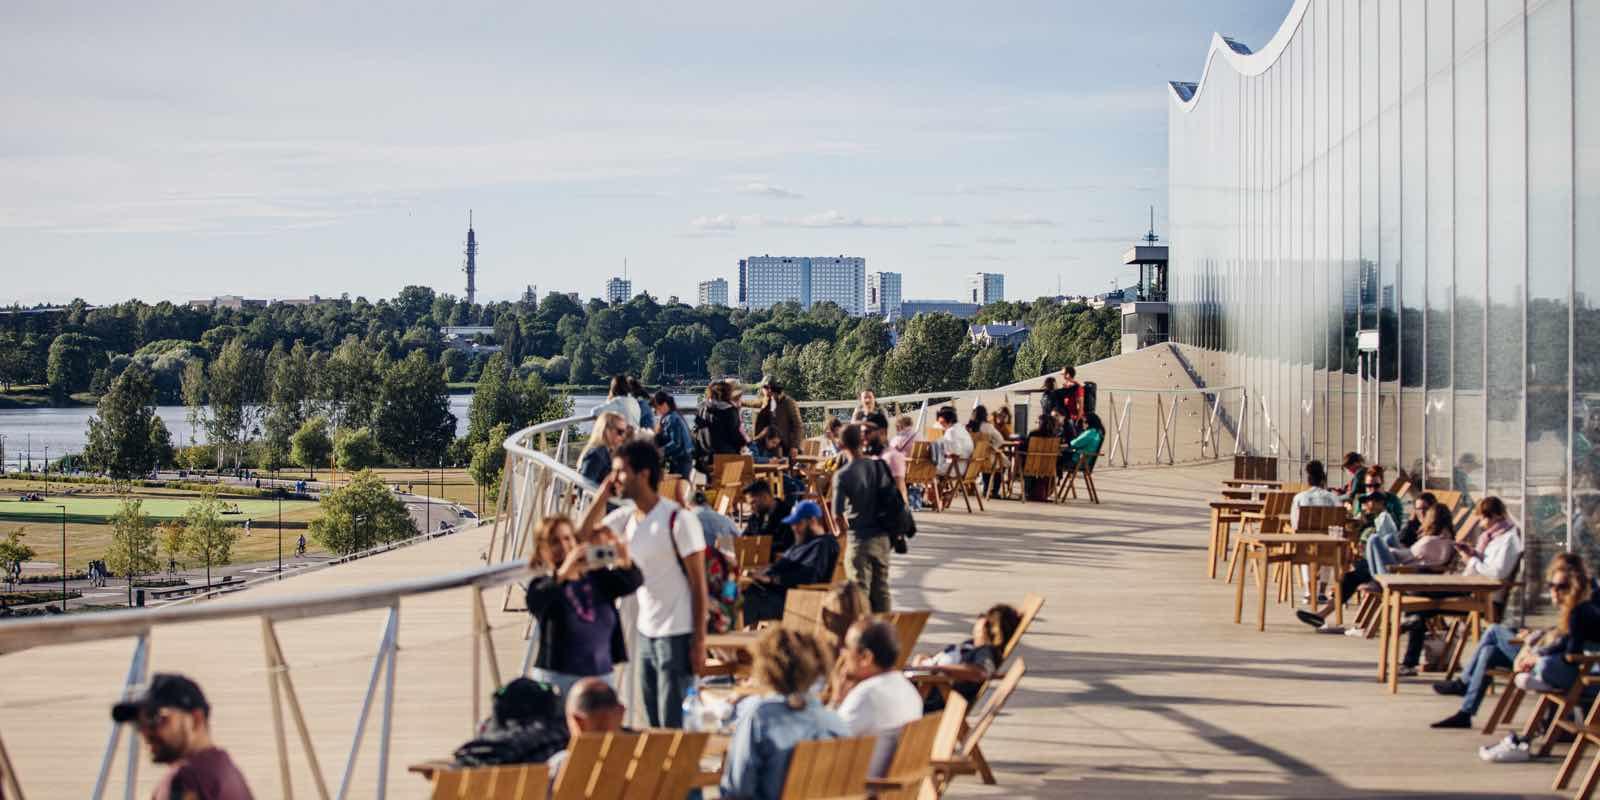 Oodi, Helsinki